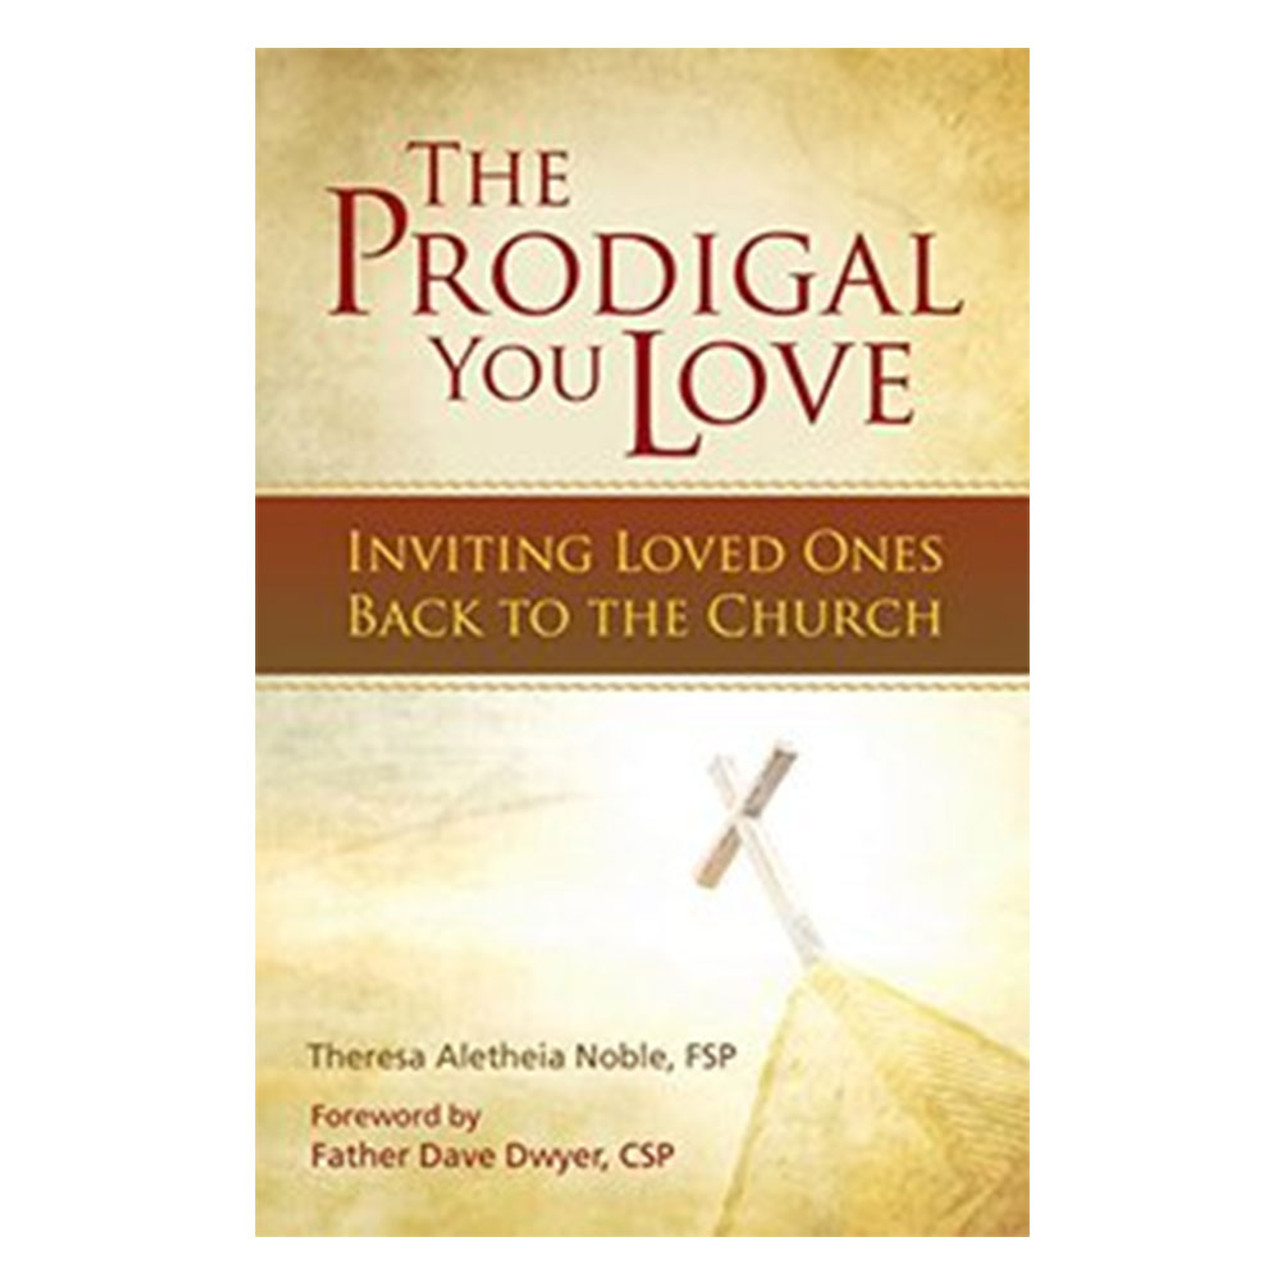 The Prodigal You Love Noble, Sr. Theresa Aletheia